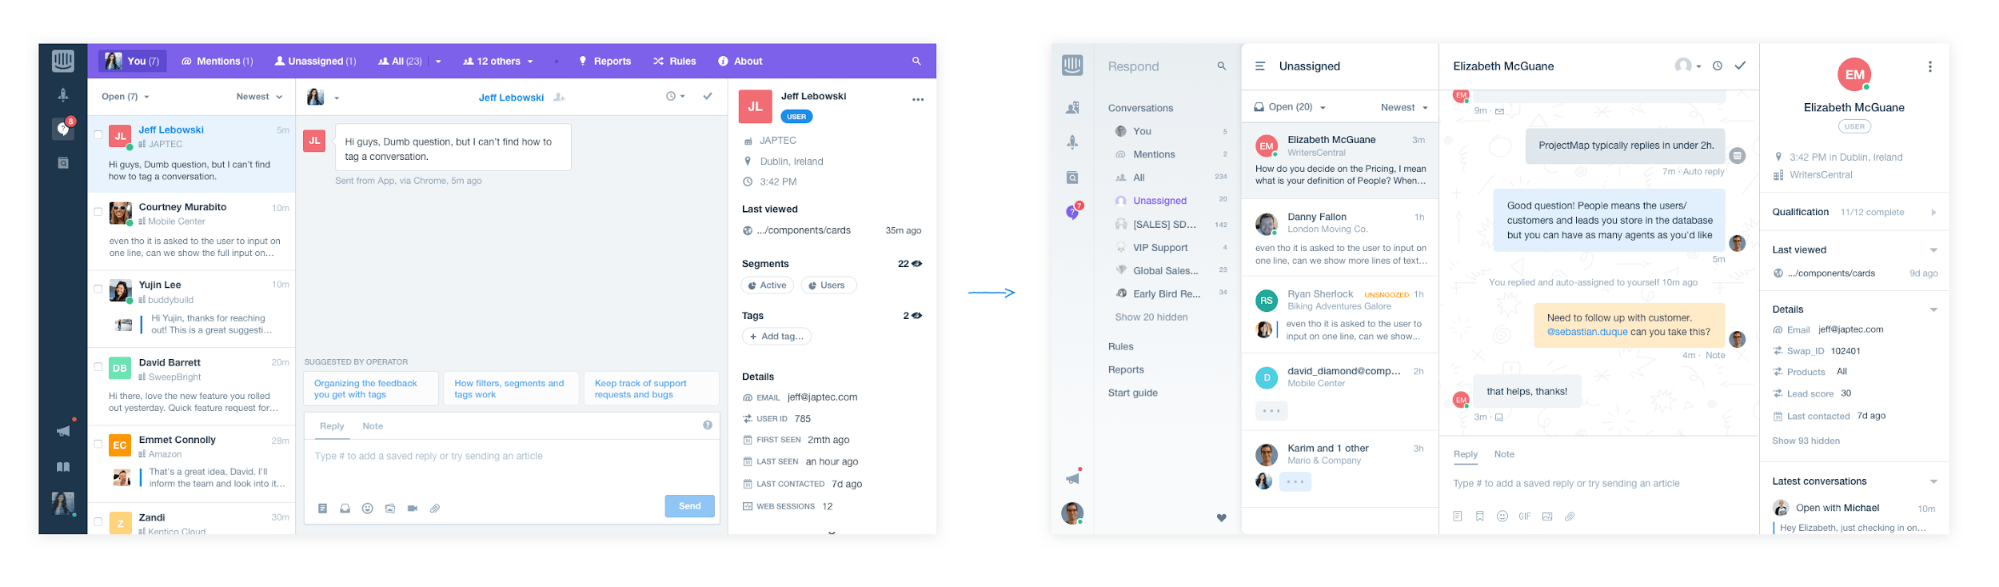 Inbox change